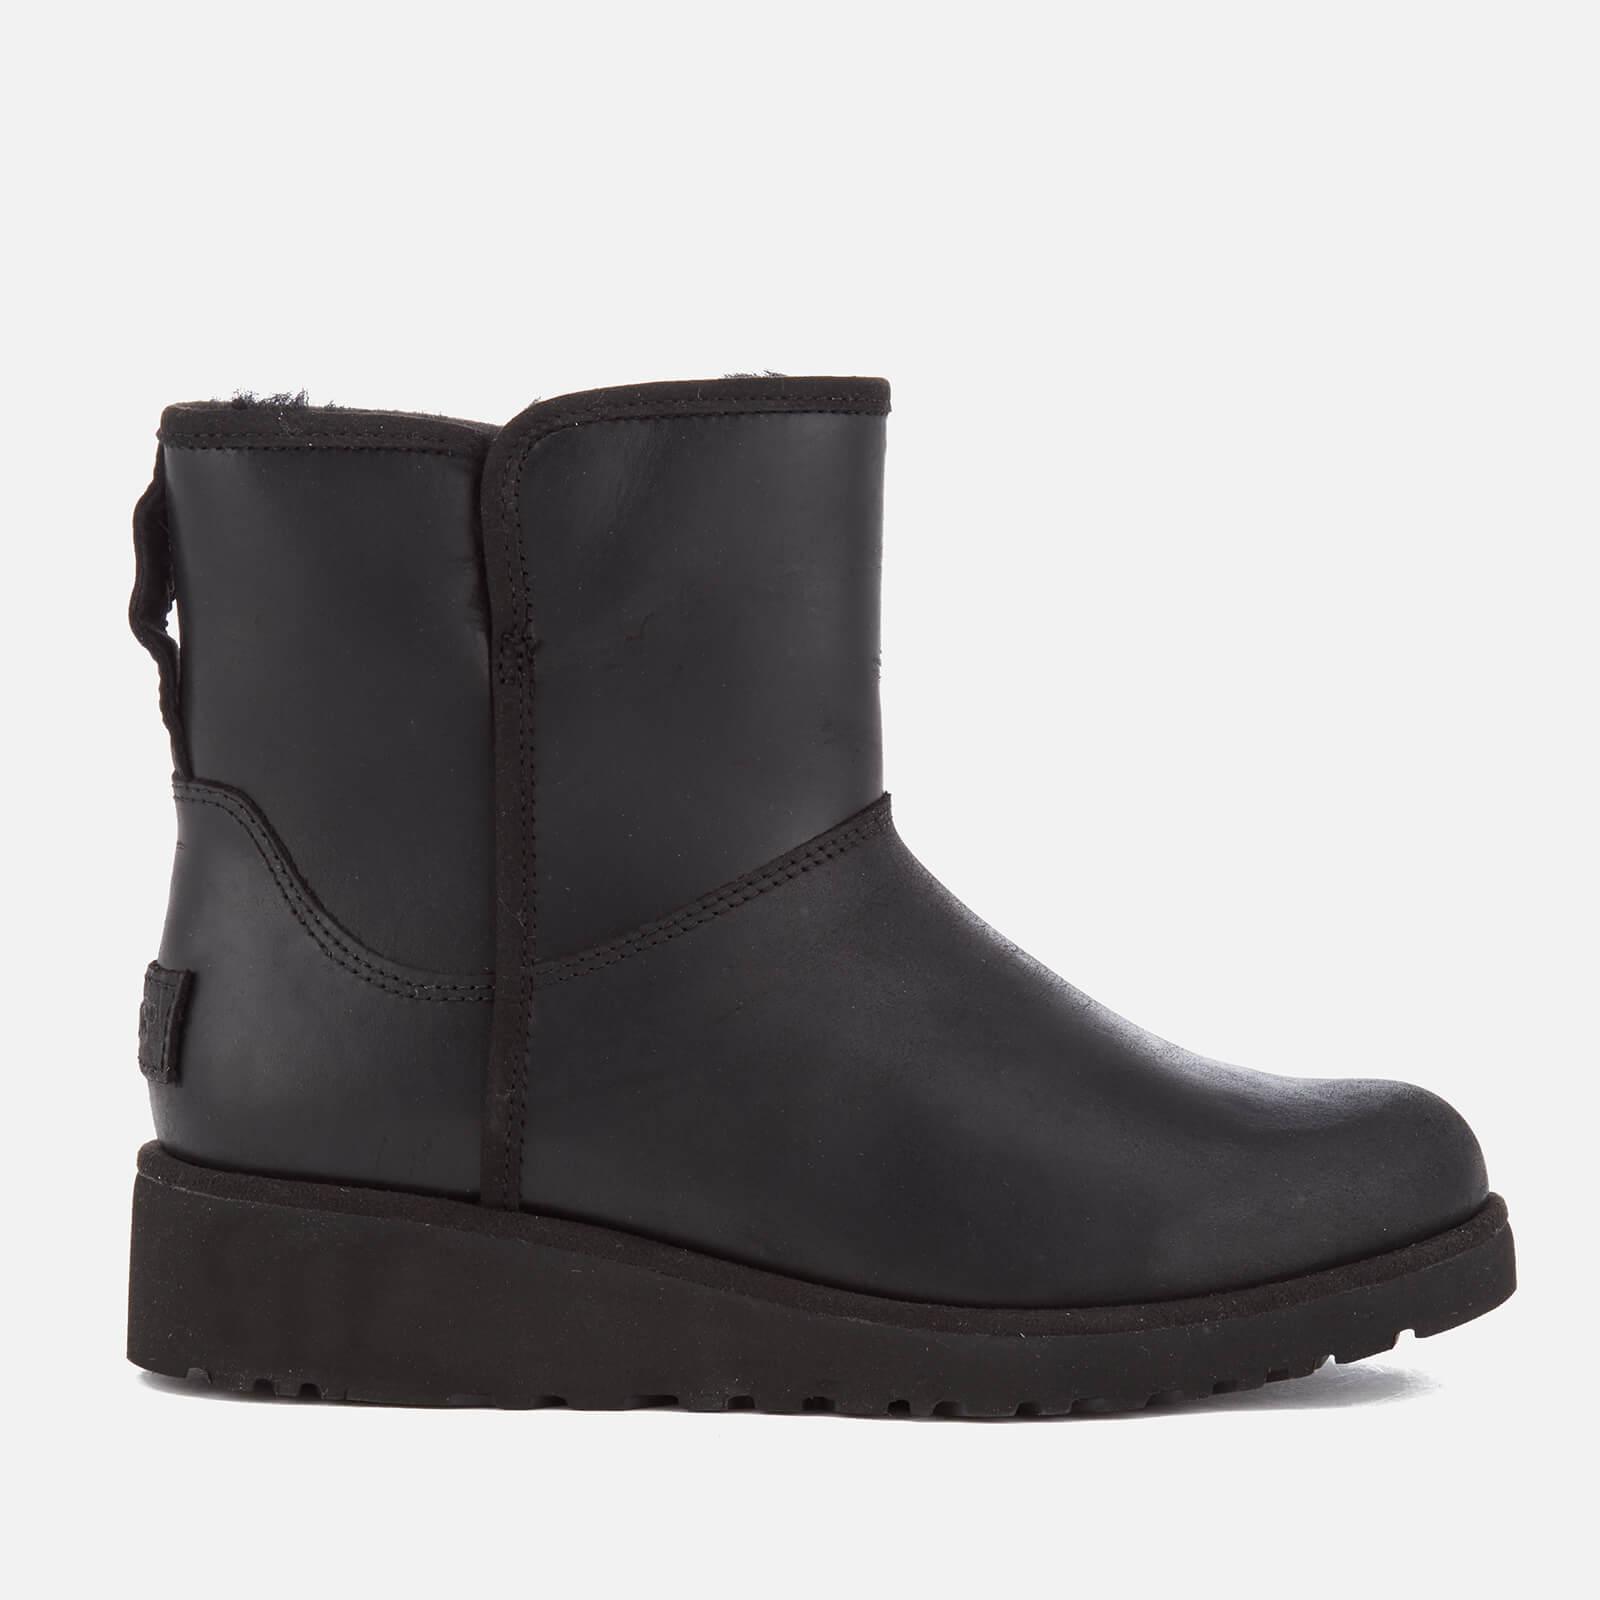 5a2065c626a UGG Women's Kristin Classic Slim Leather Sheepskin Boots - Black